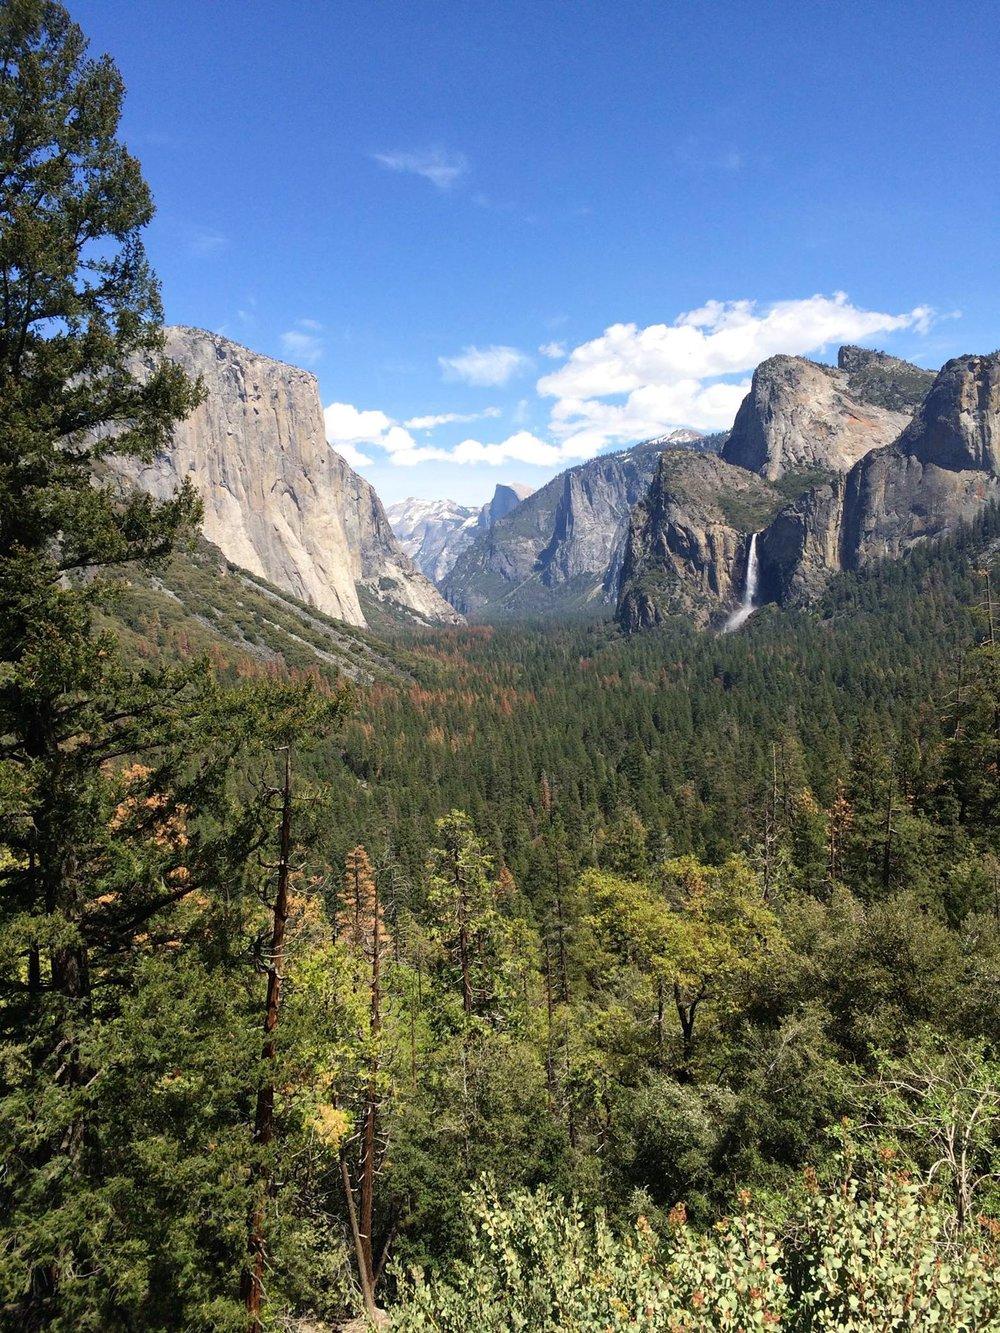 Tunnel View of Yosemite Valley, Bridalveil Falls, El Capitan, Half Dome,   Victoria Nightingale